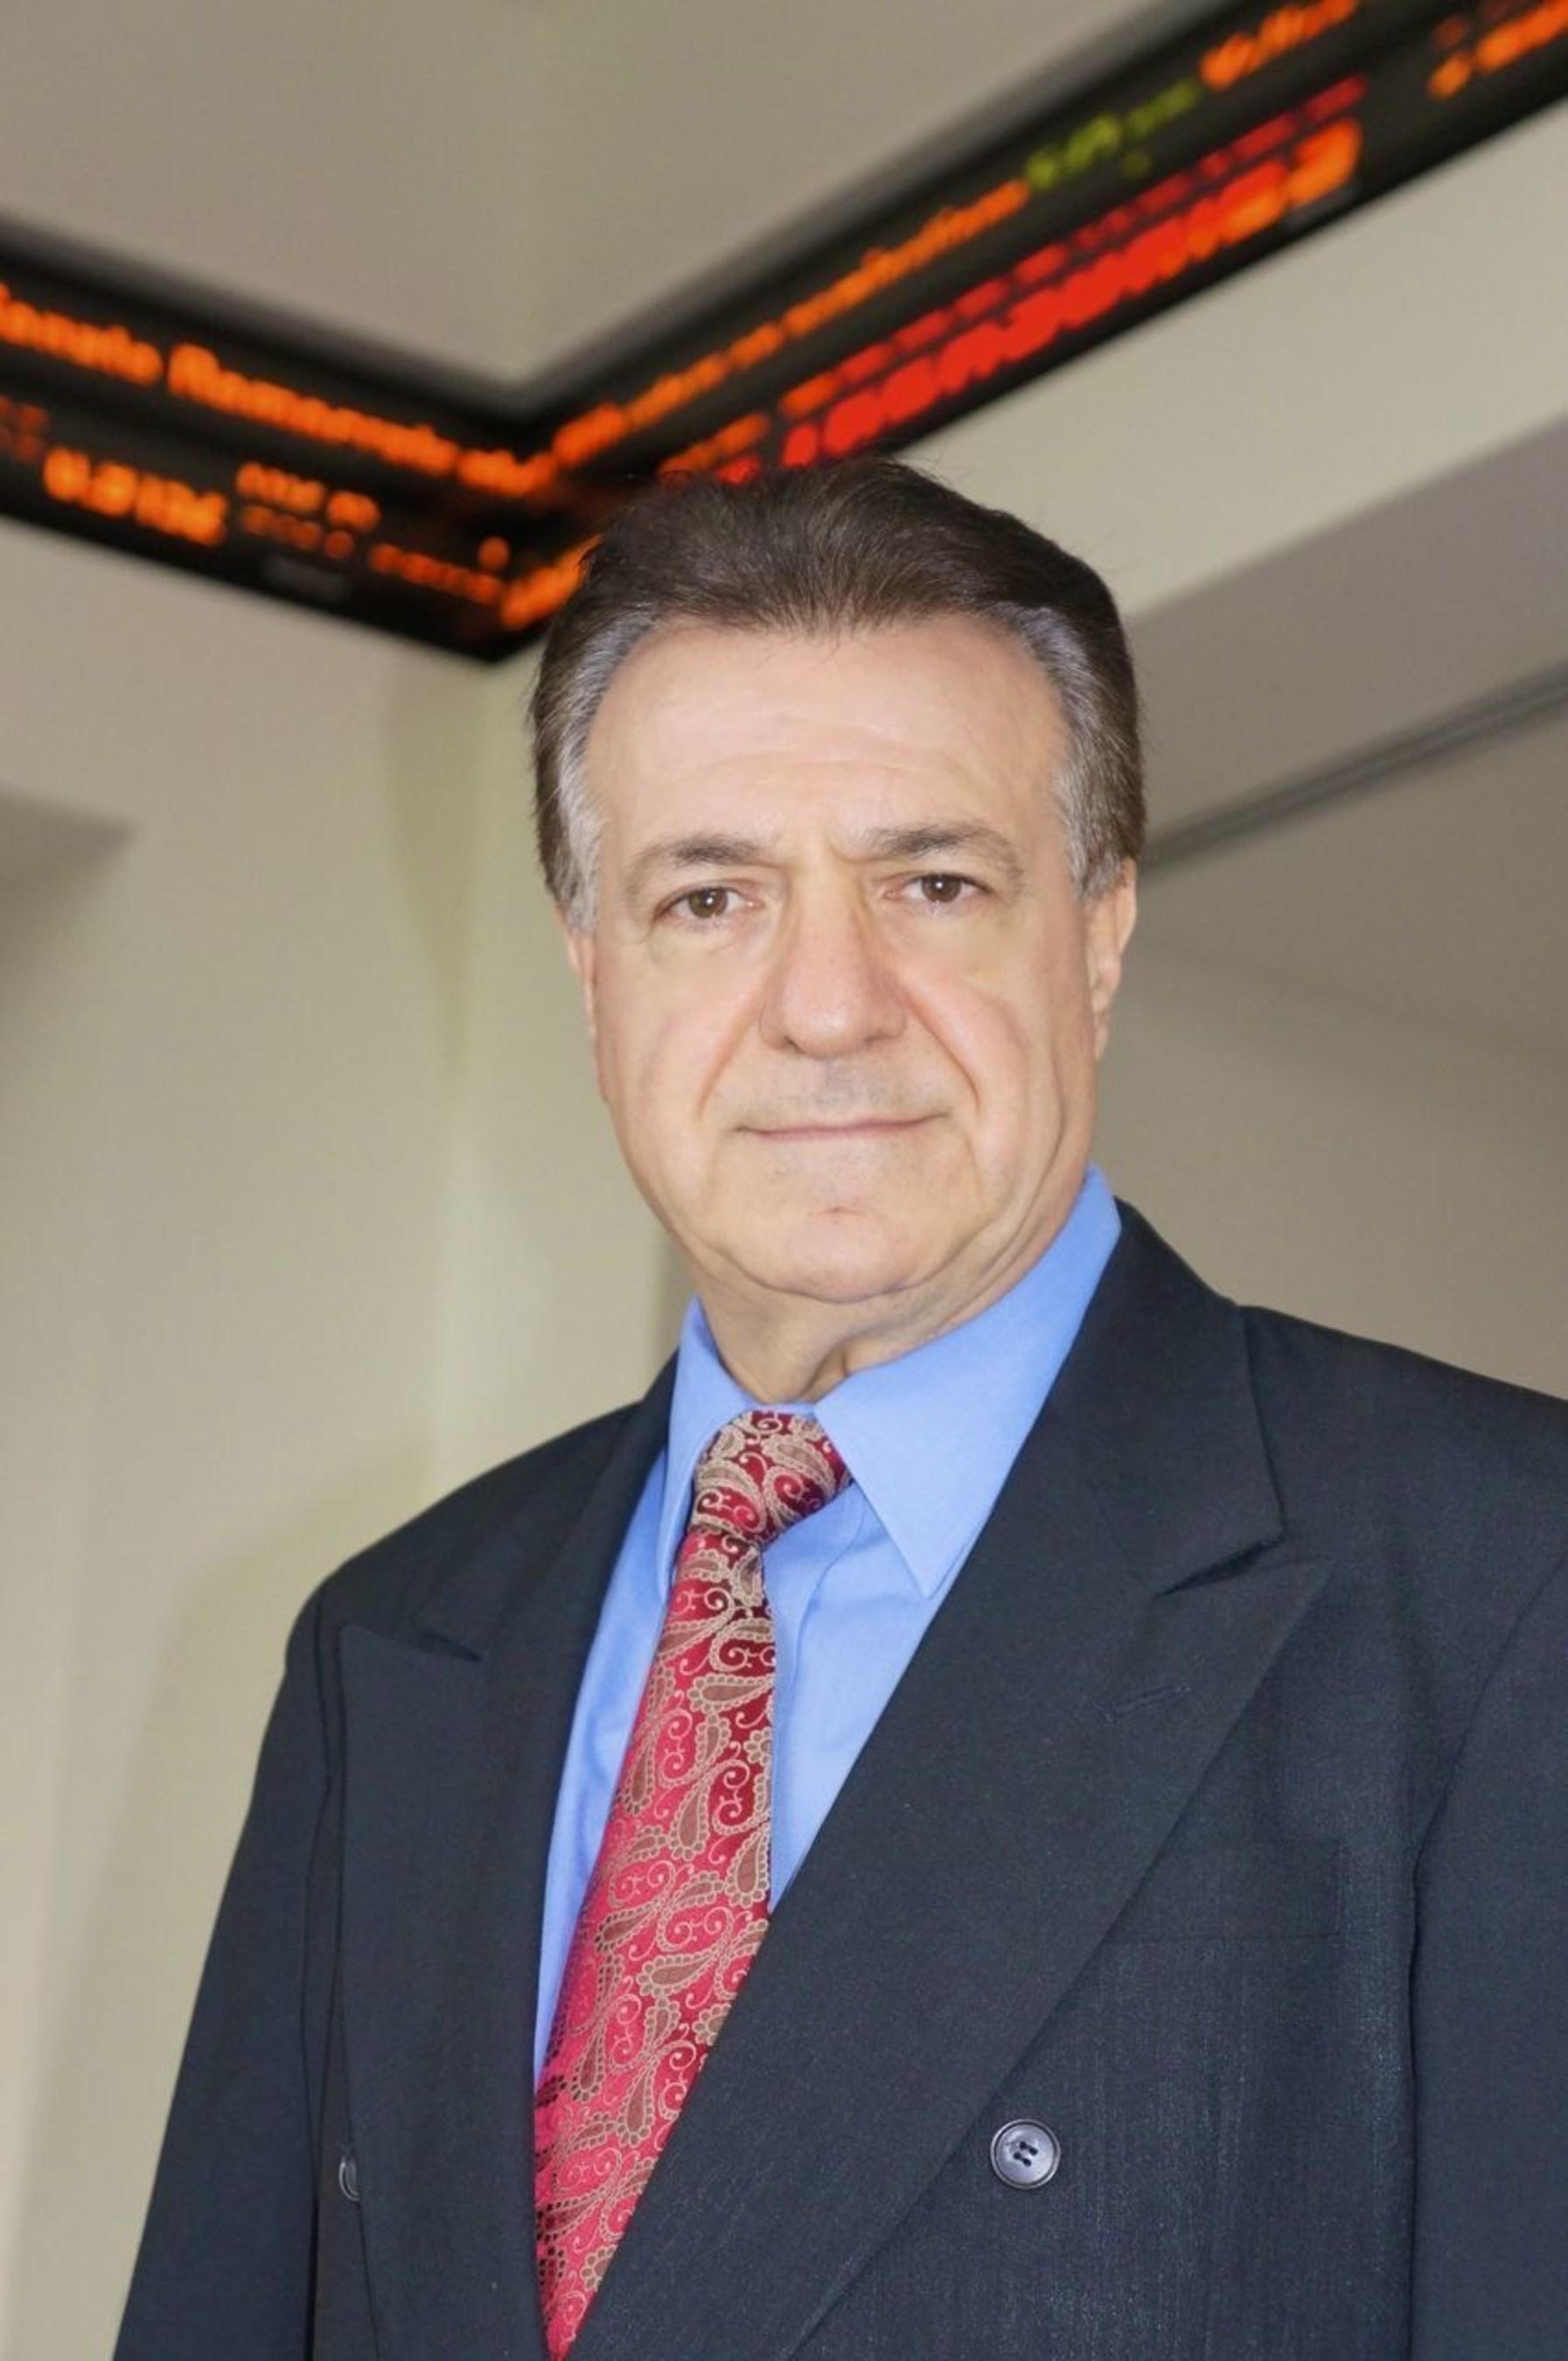 Woodbury University Business School Professor Named Faculty Judge of Sustainability Case Writing